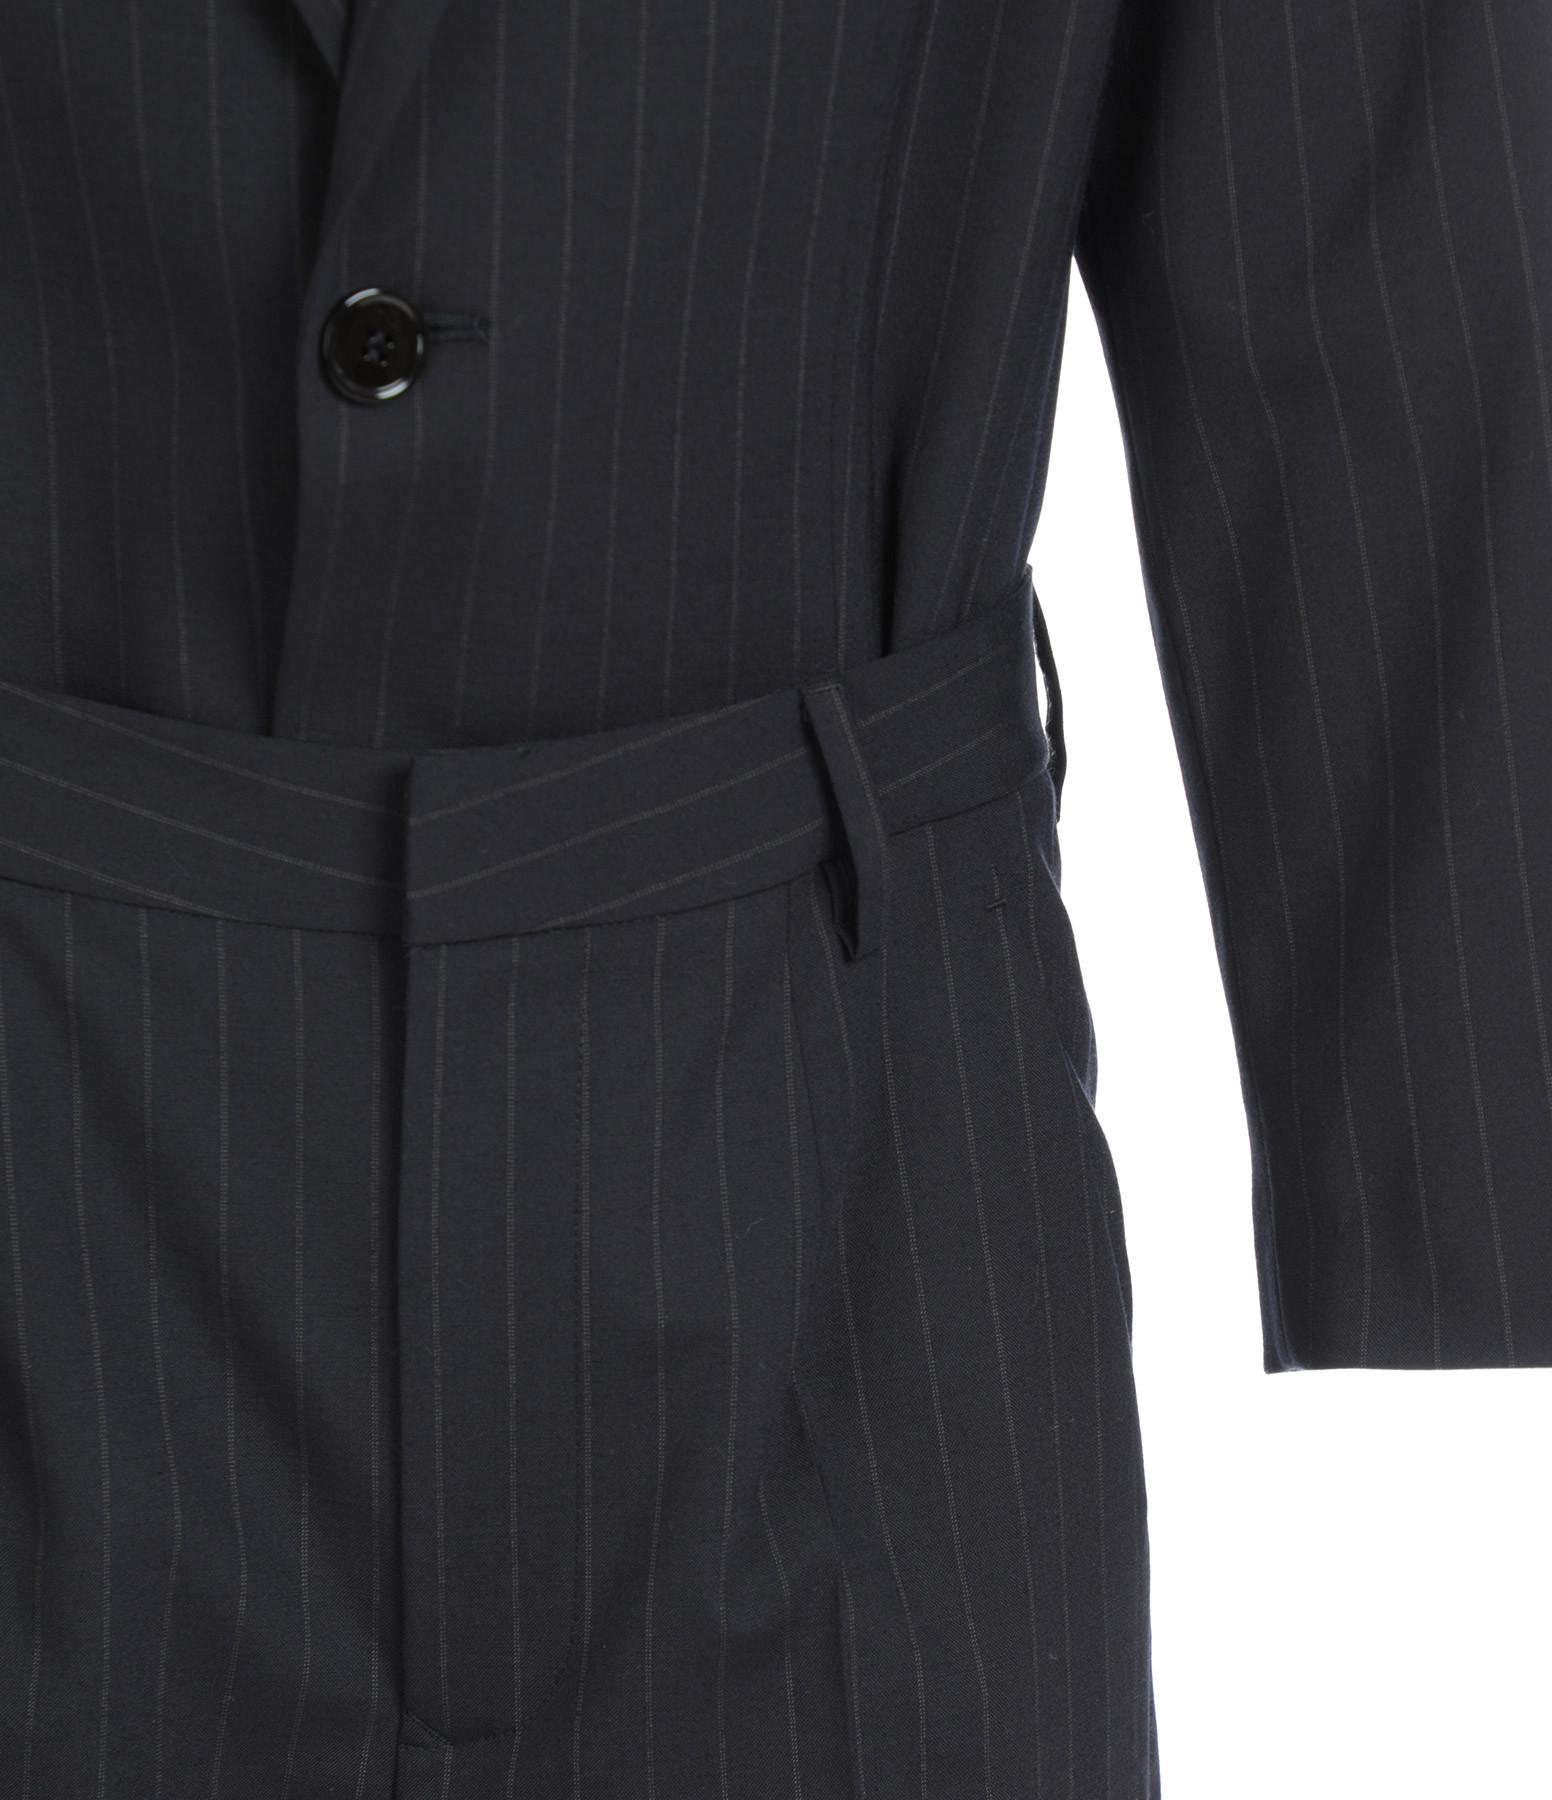 MM6 MAISON MARGIELA - Combinaison Pantalon Laine Rayures Bleu